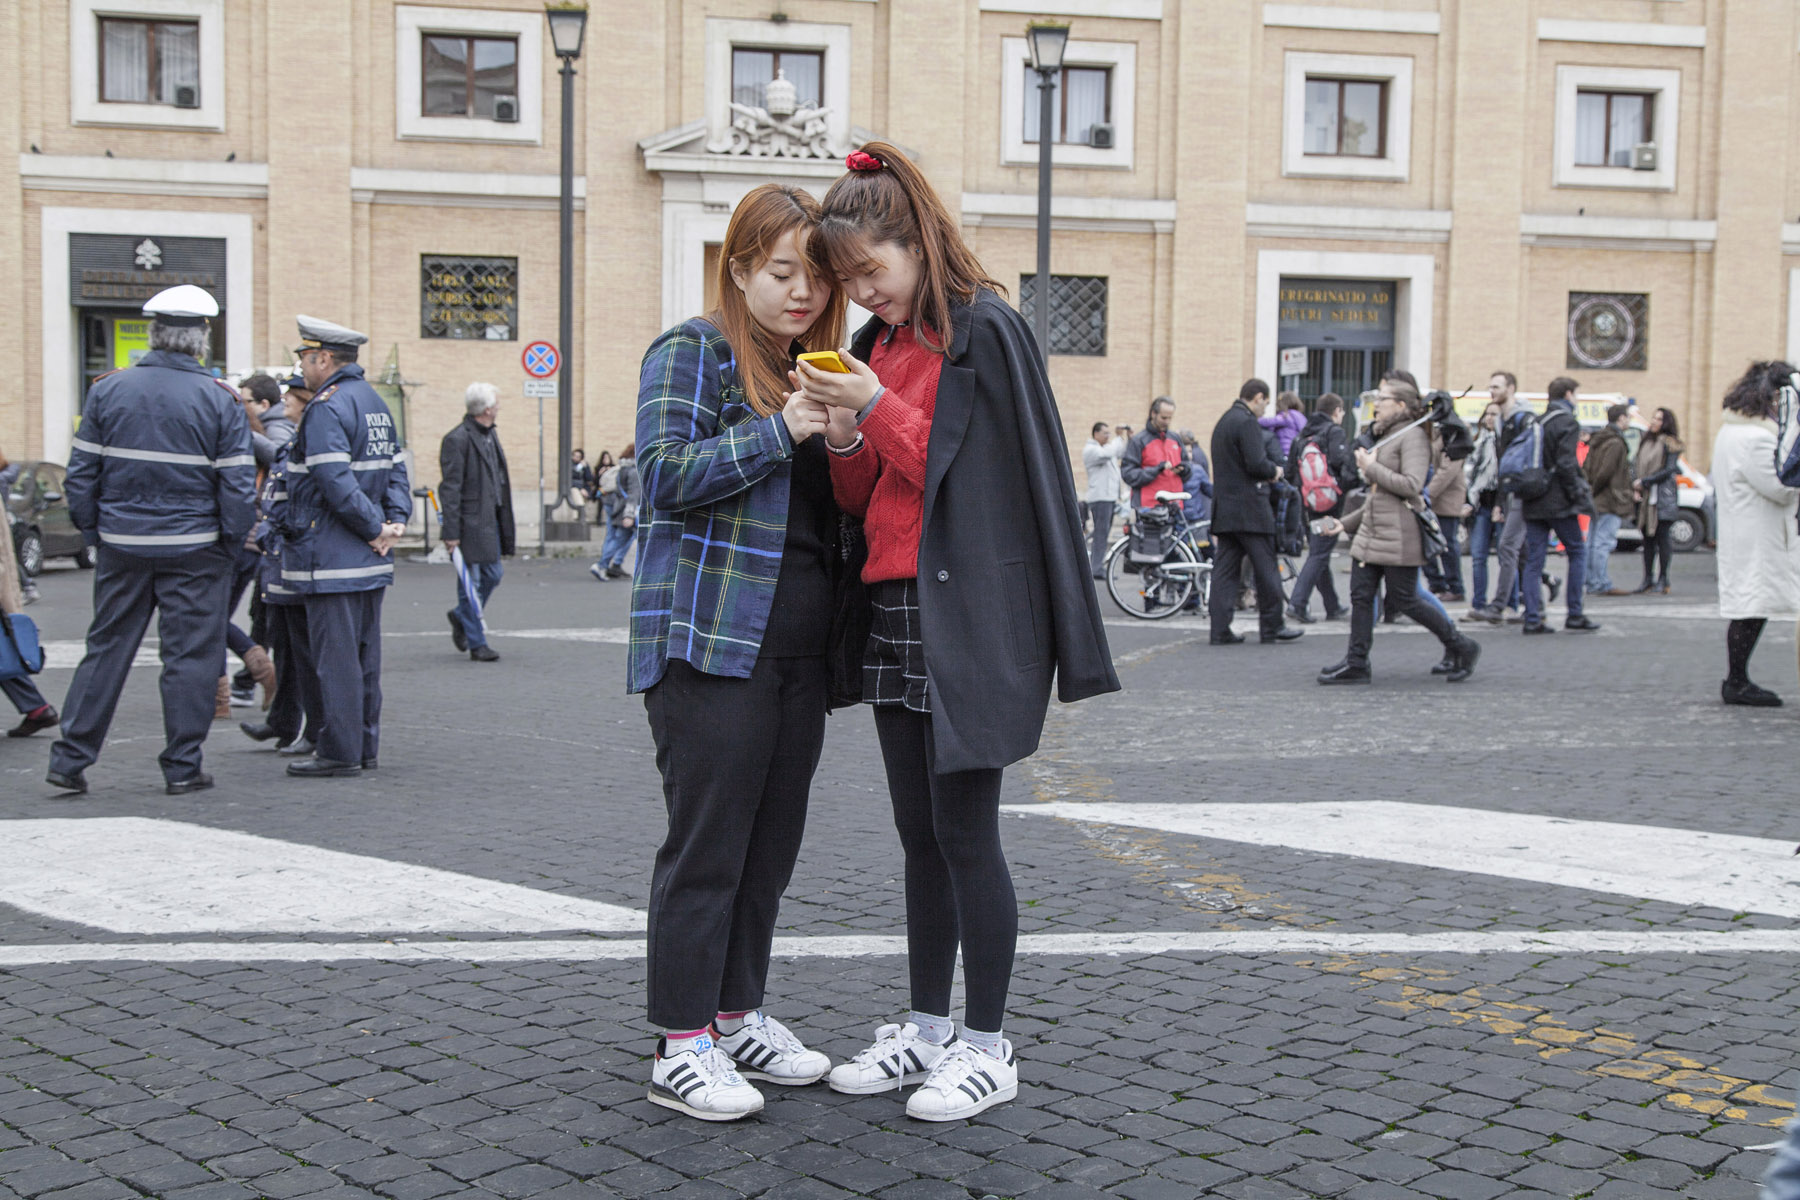 Chiara Spaghetti Kurtovic Popes Two 13